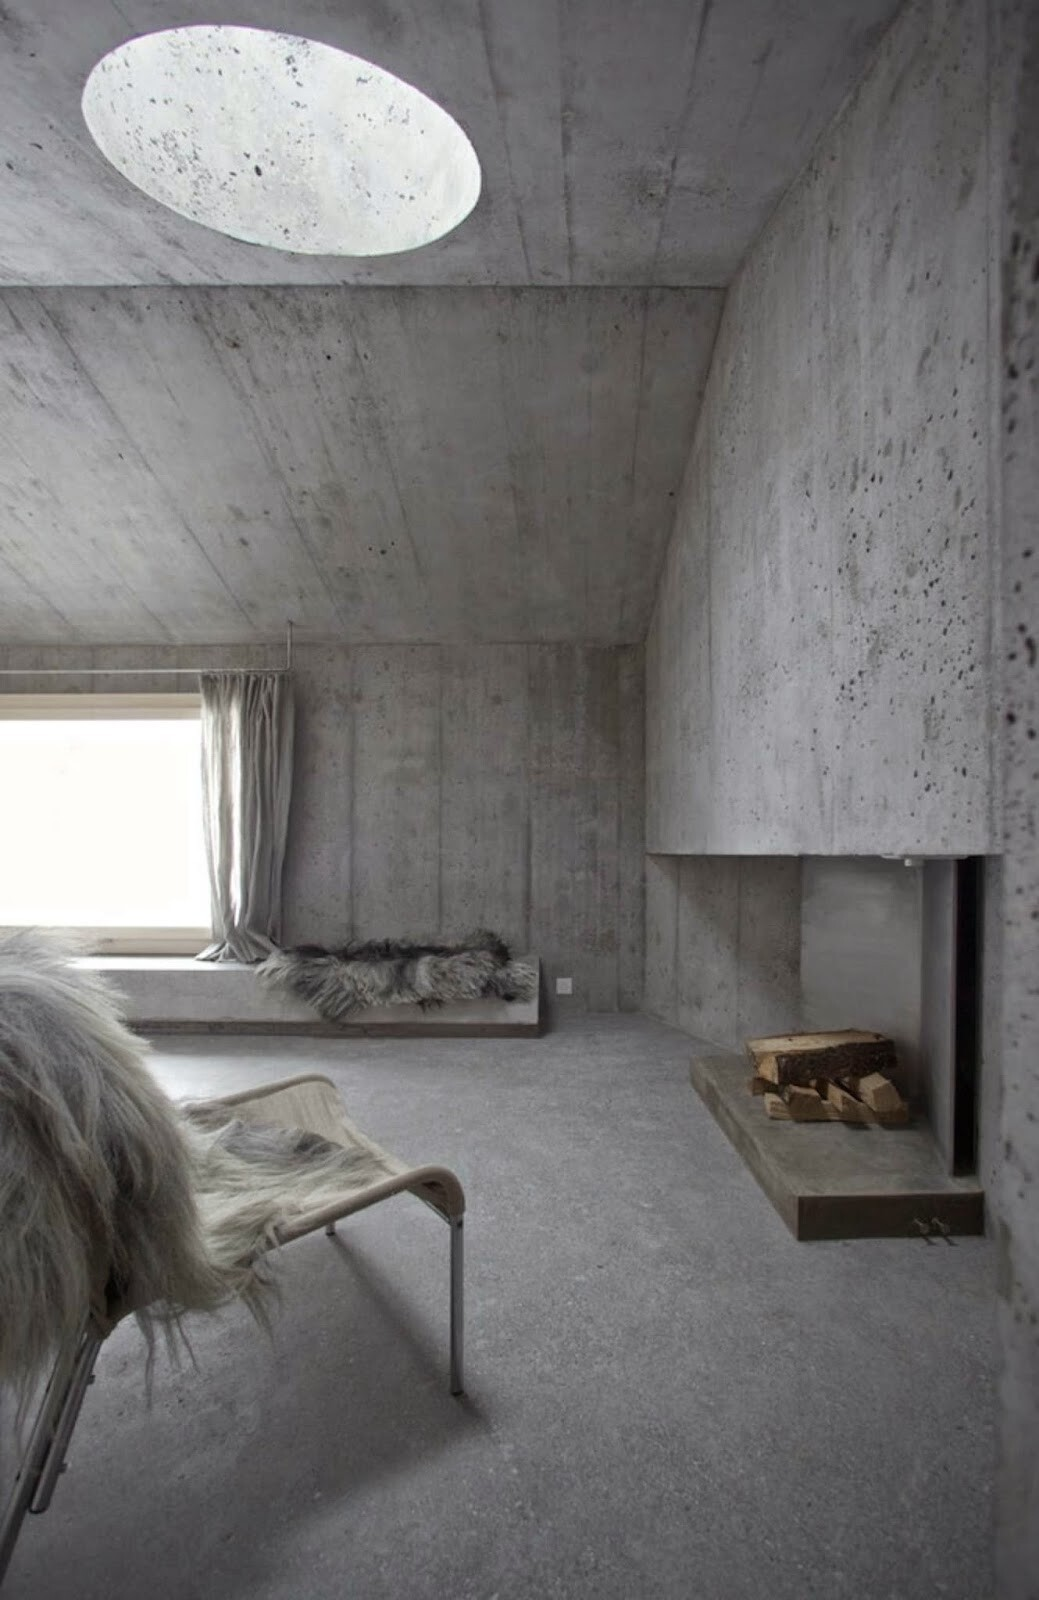 Concrete Cabin Refugi Lieptgas Fascinating Concrete Cabin In The Swiss Alps